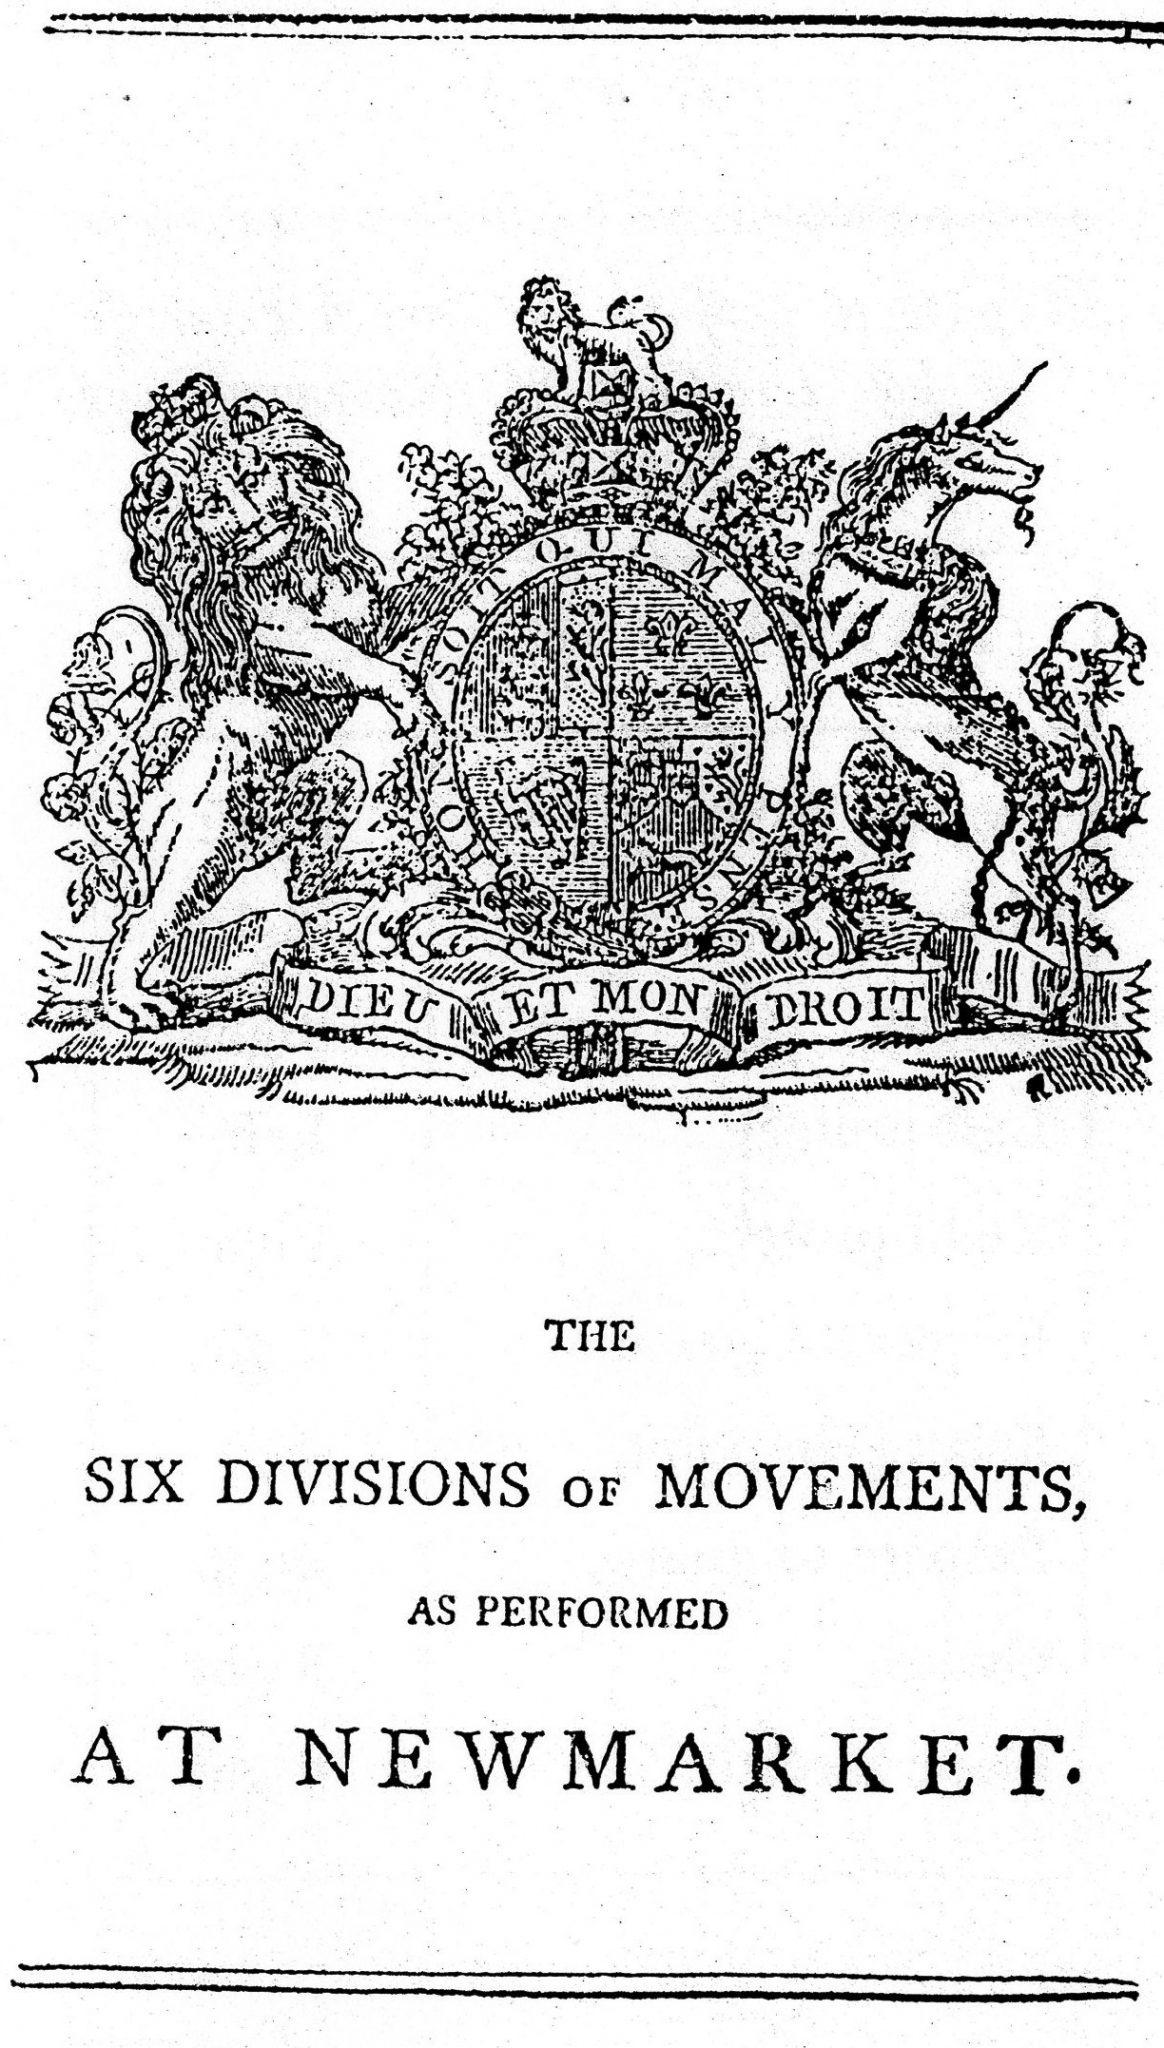 An Abridgement of the New Broad Sword Exercize, London, 1797 3